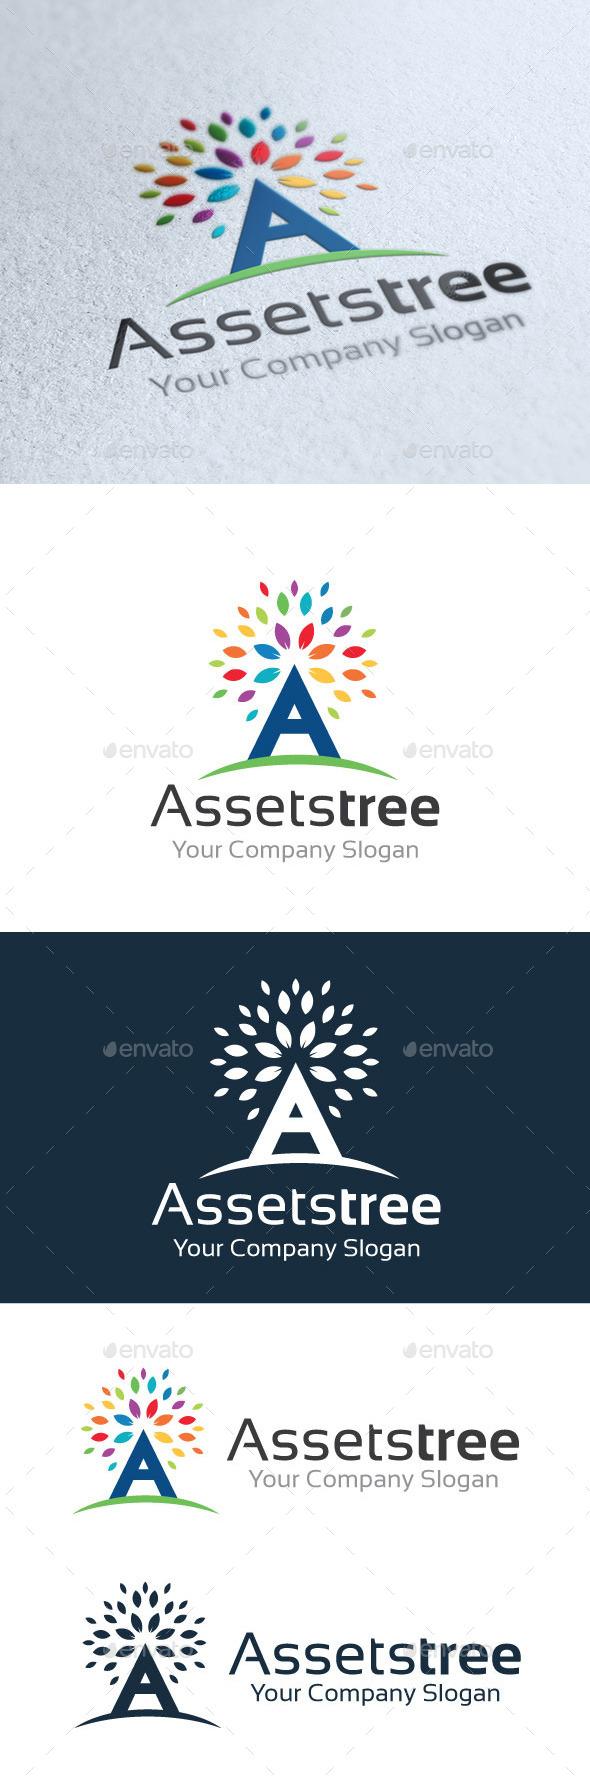 Assets Tree